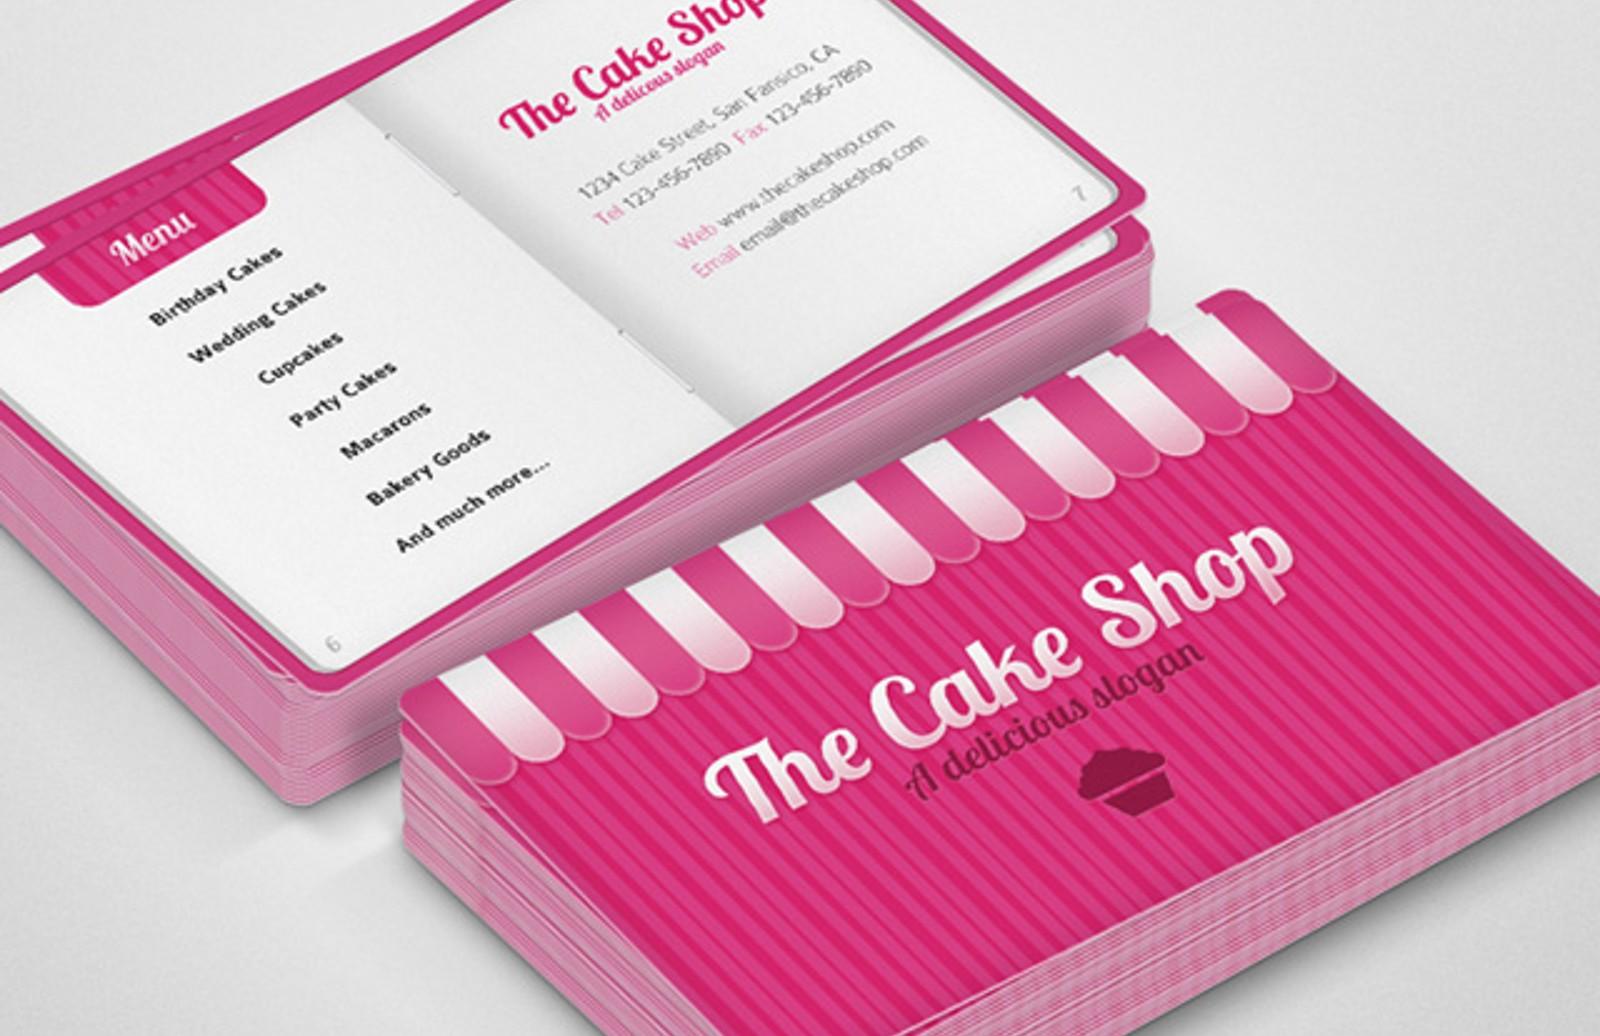 Business card cake shop choice image card design and card template business card for cake shop images card design and card template business card cake shop image reheart Image collections